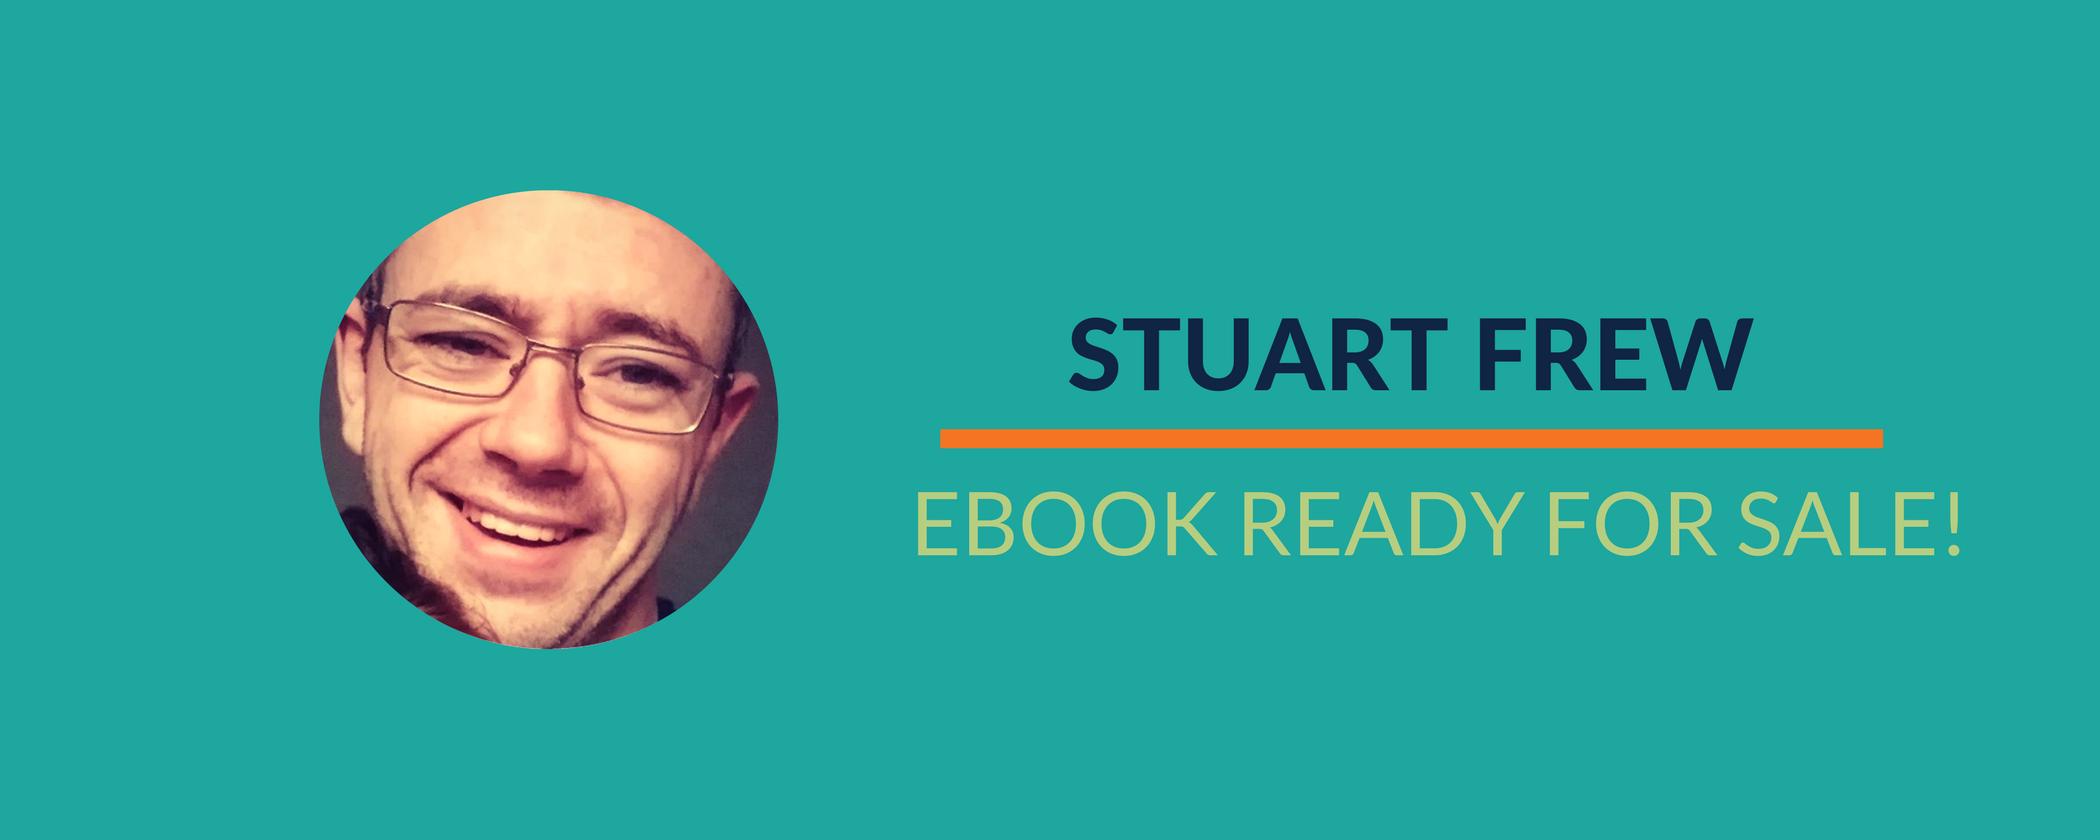 Success Story: Stuart's eBook has been published